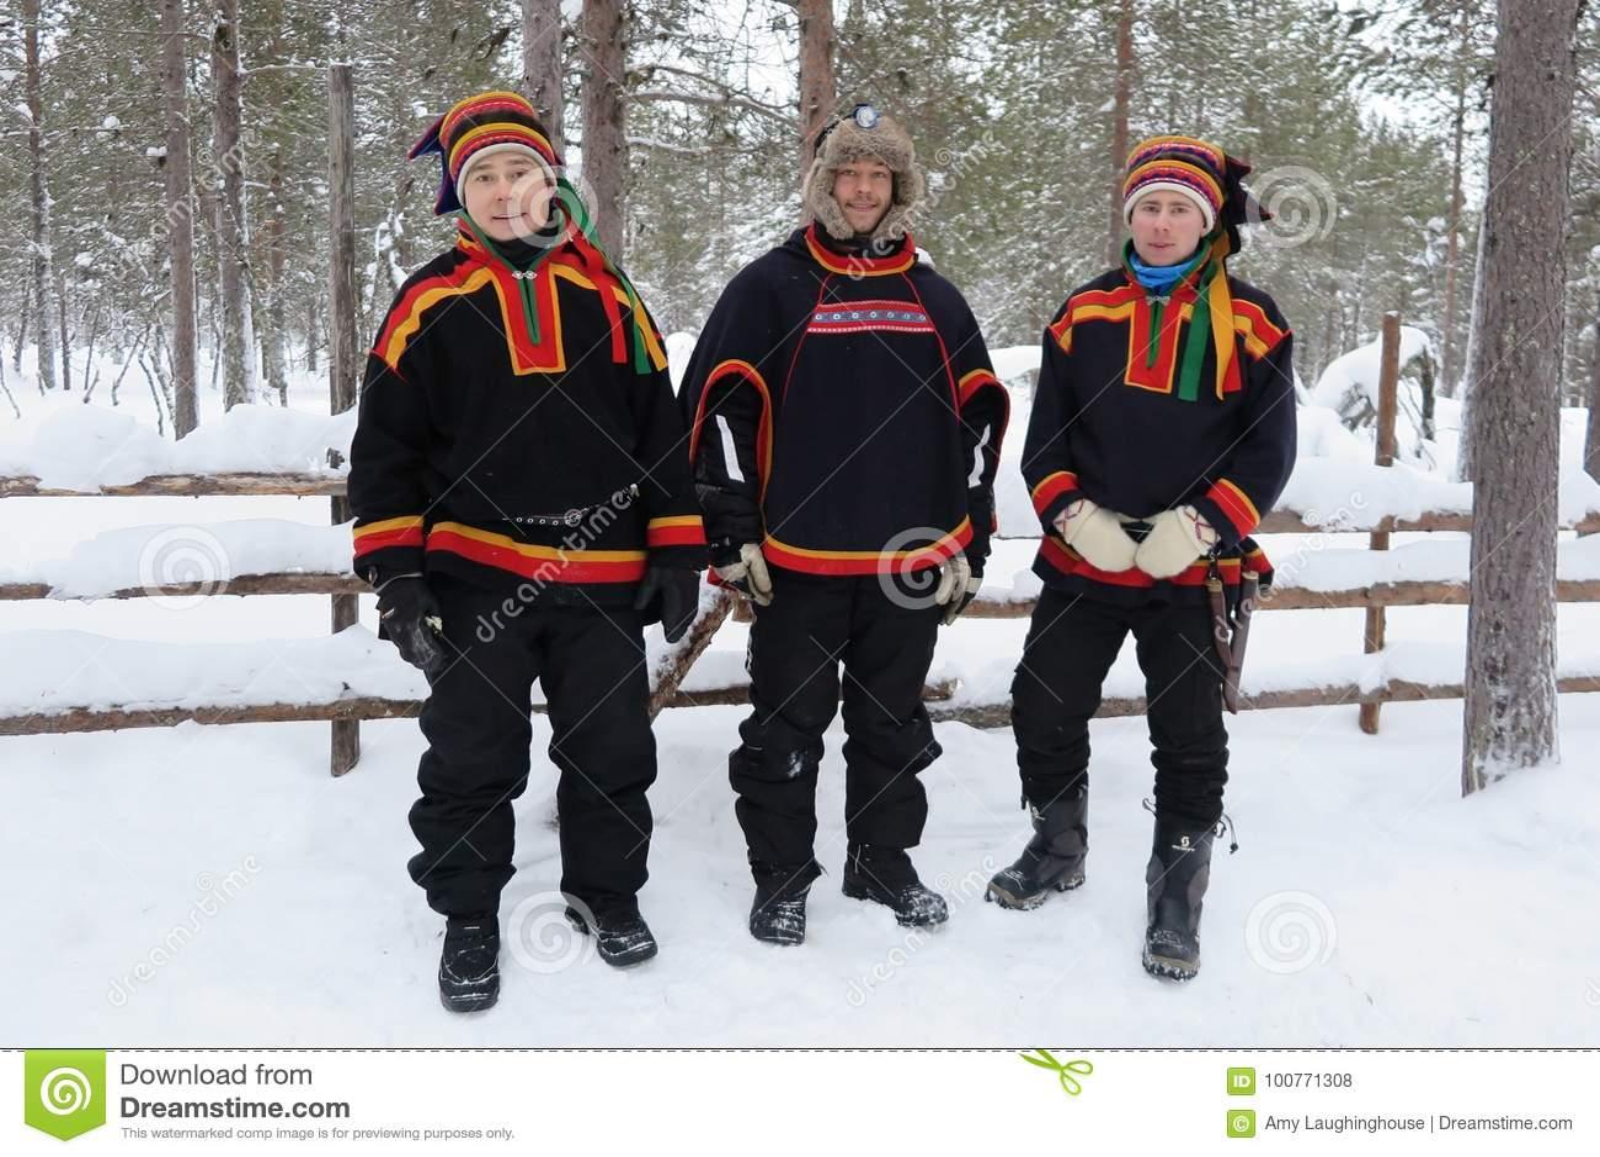 Three Sami Men In Snow In Lapland 4bfcca8d6d8